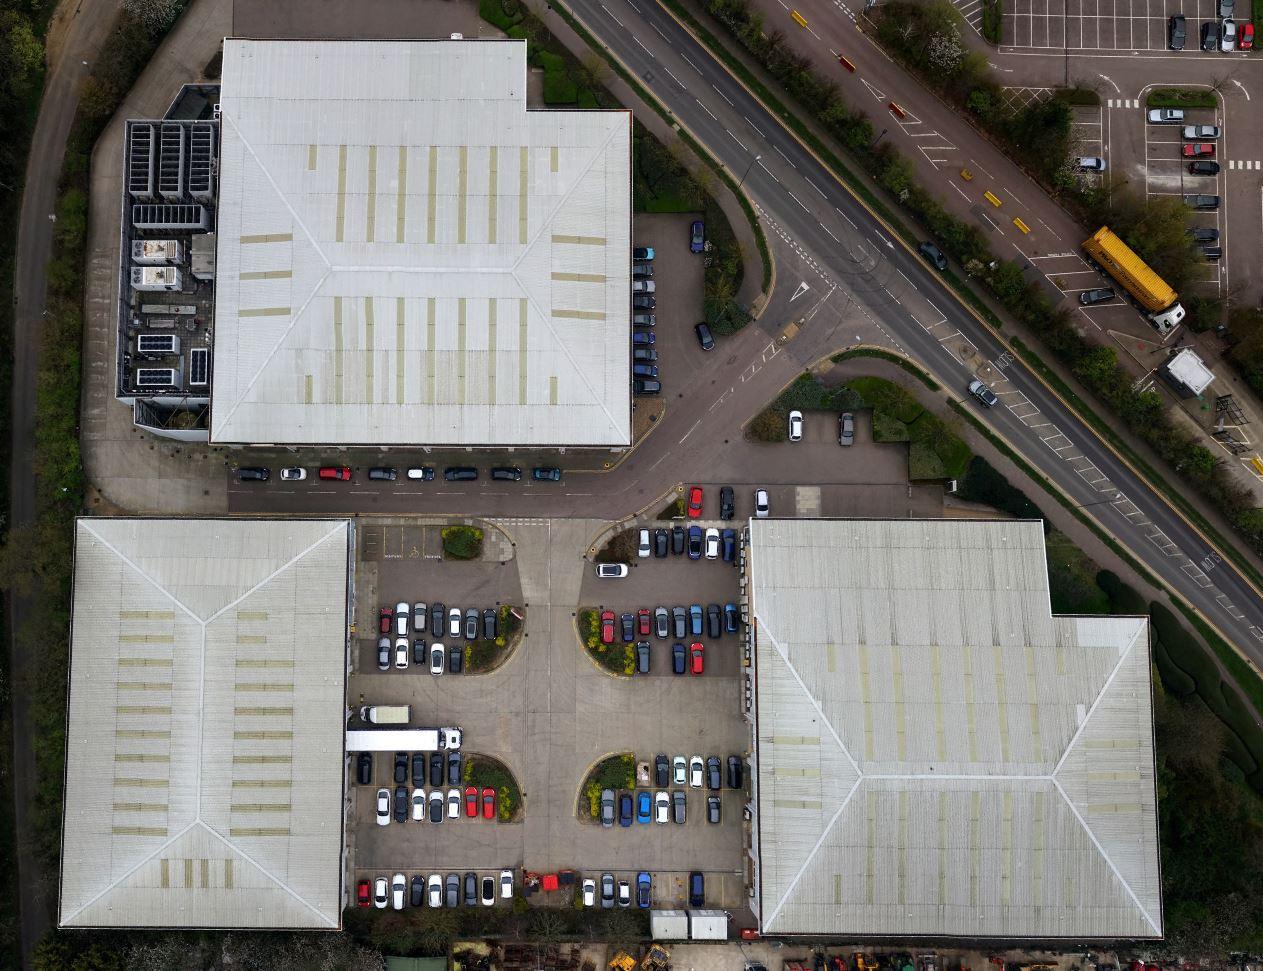 industrial_estate_commercial_factory_roof_drone_survey_vertex.JPG